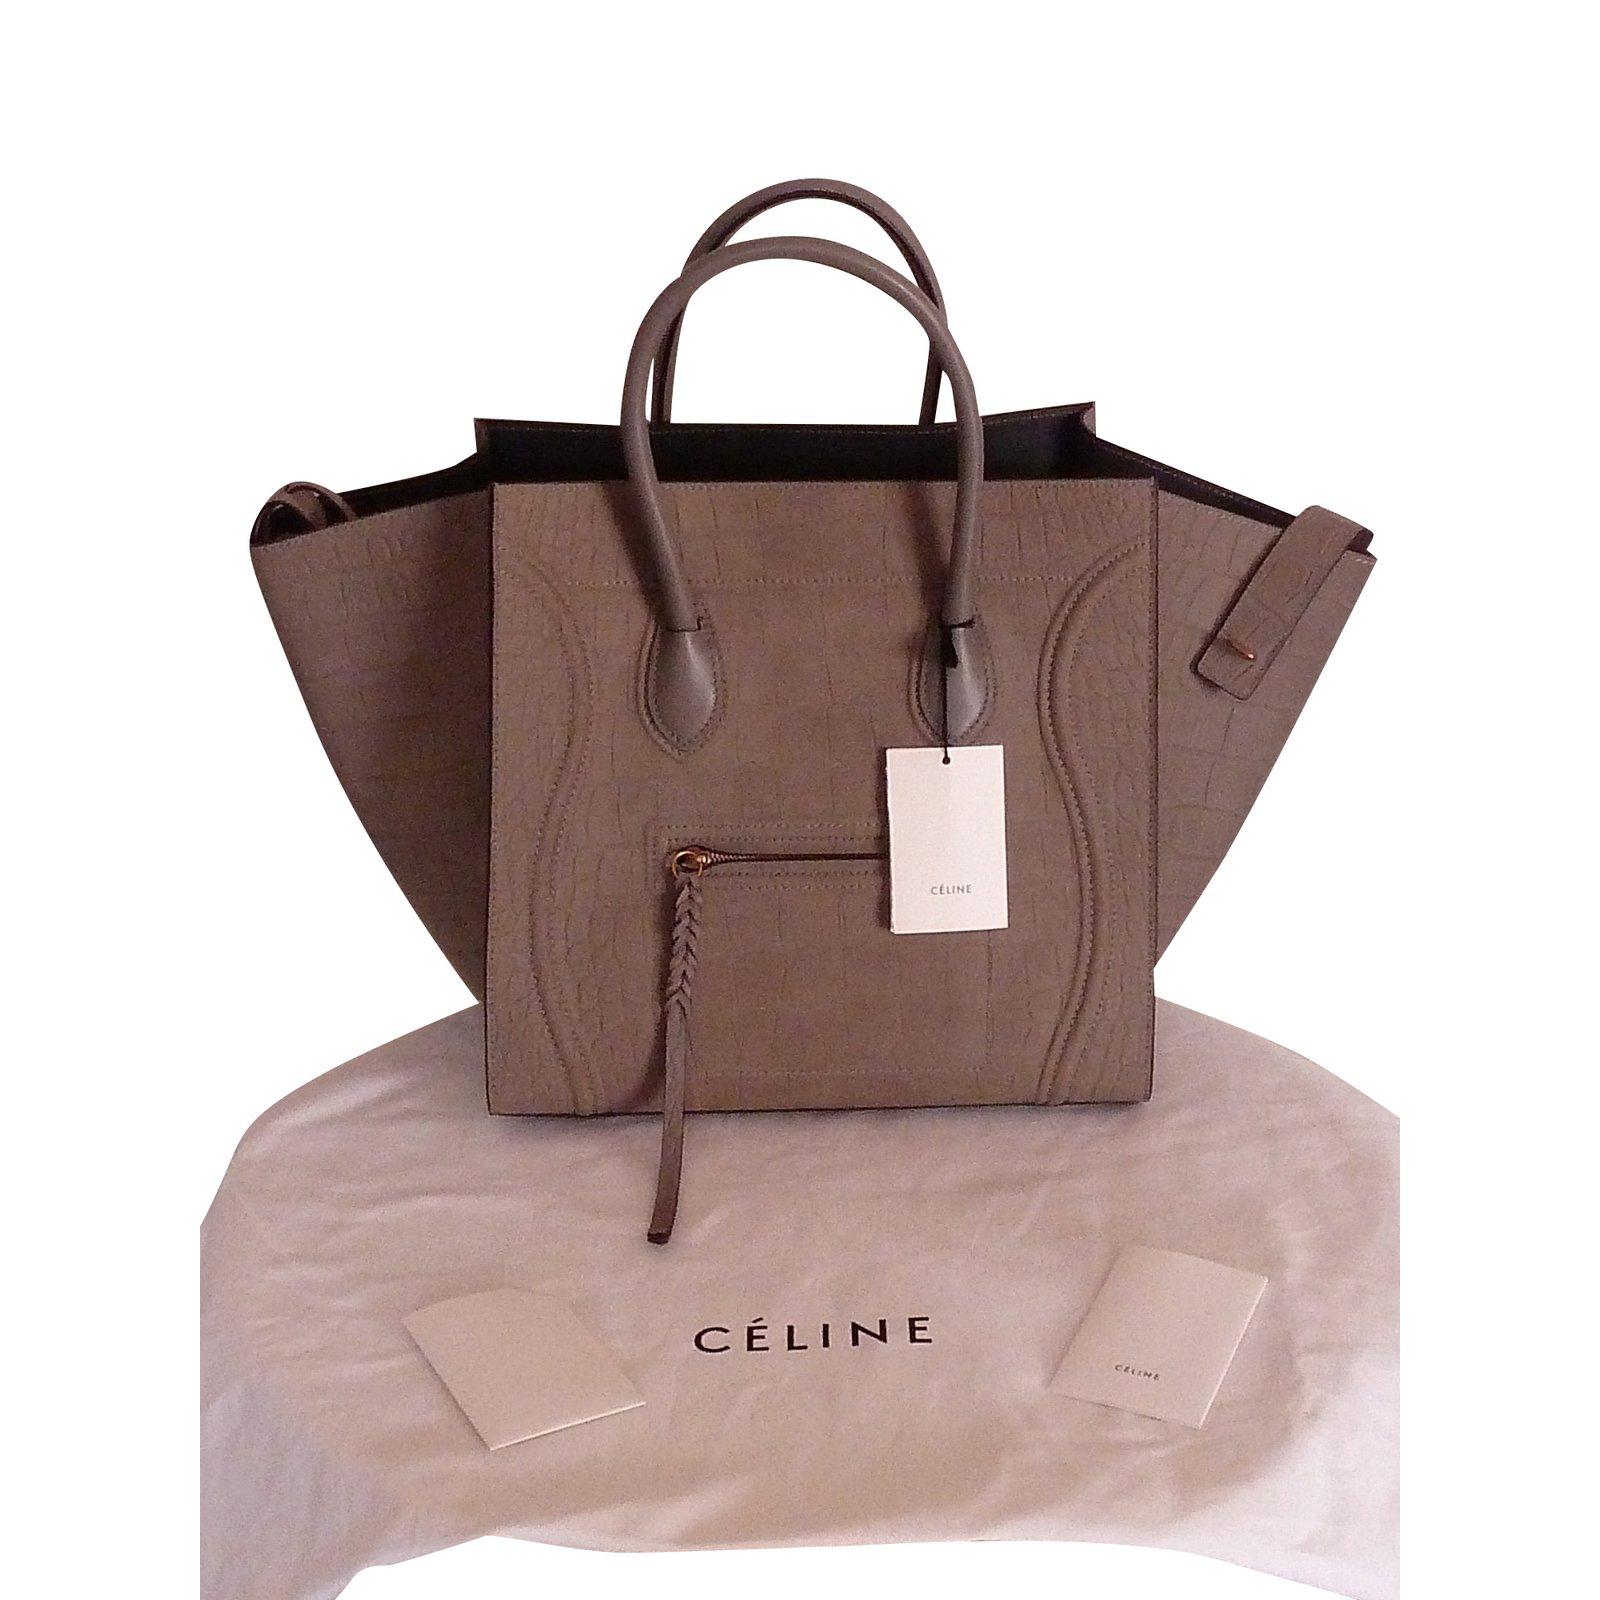 Closet Luggage À Gris Phantom Céline Cuir Sacs Joli Effet Croco 93113 Ref Main On7xxW